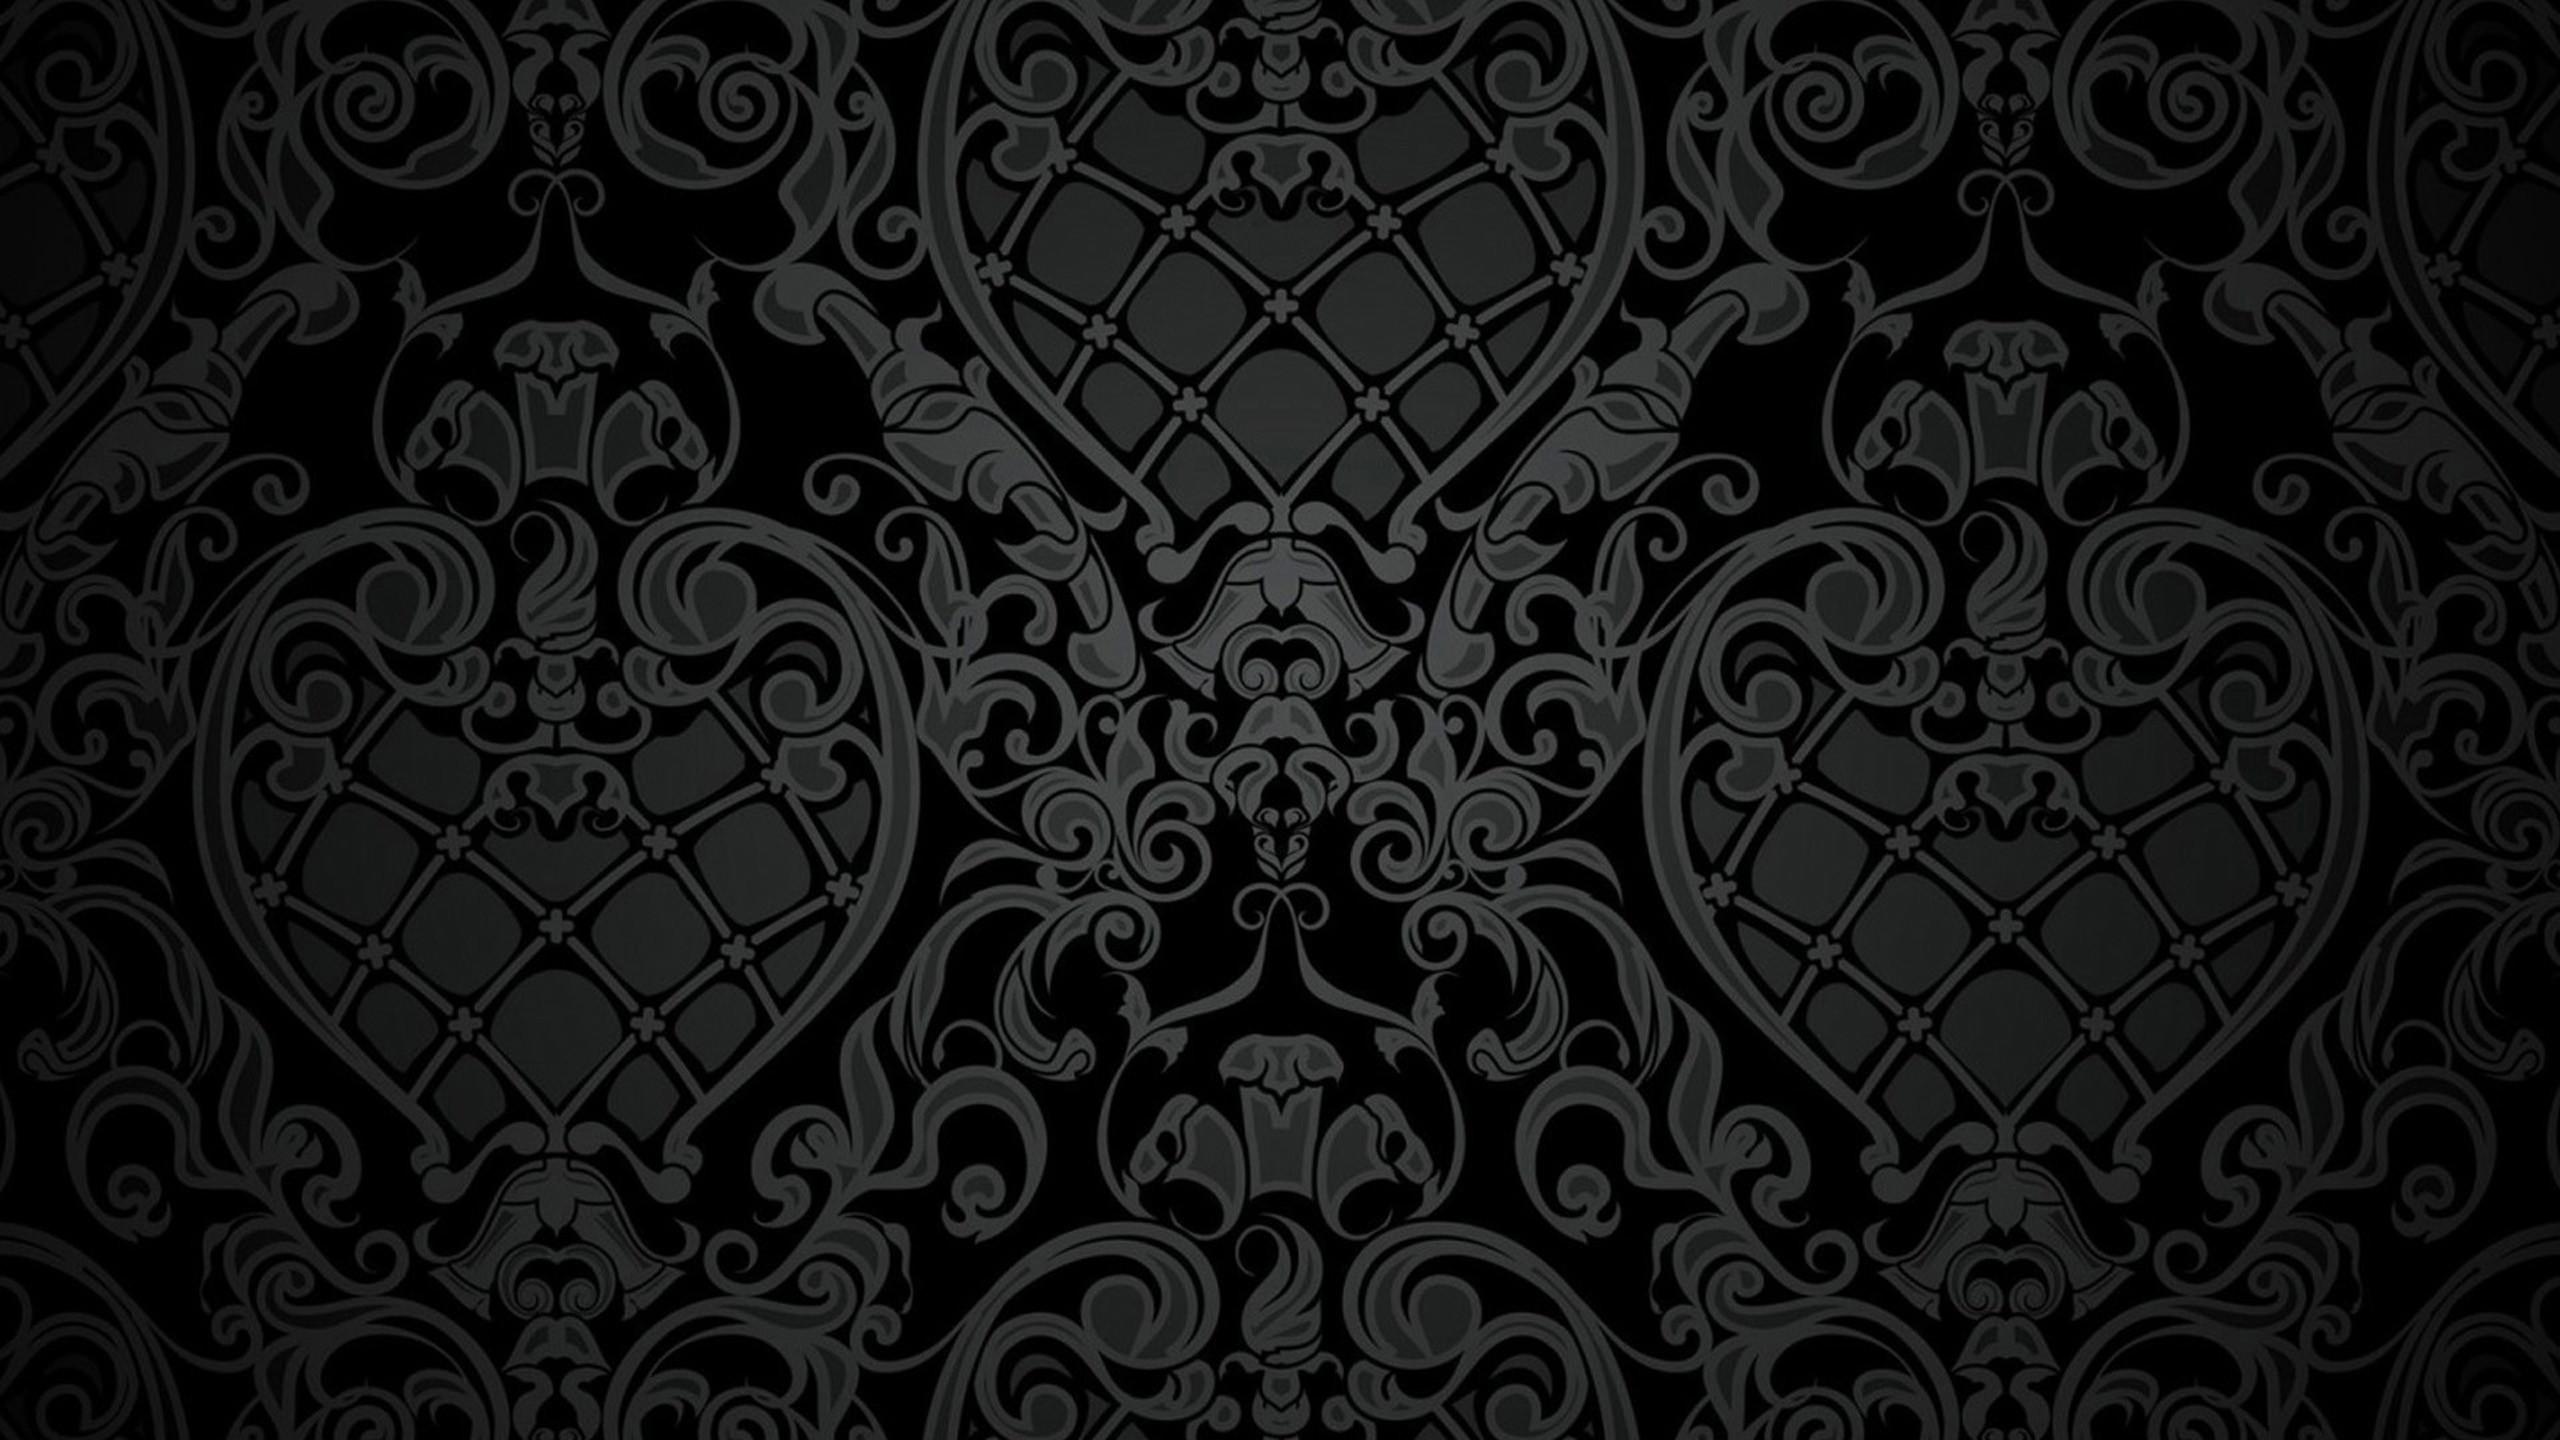 Gothic Desktop Wallpaper (55+ Images